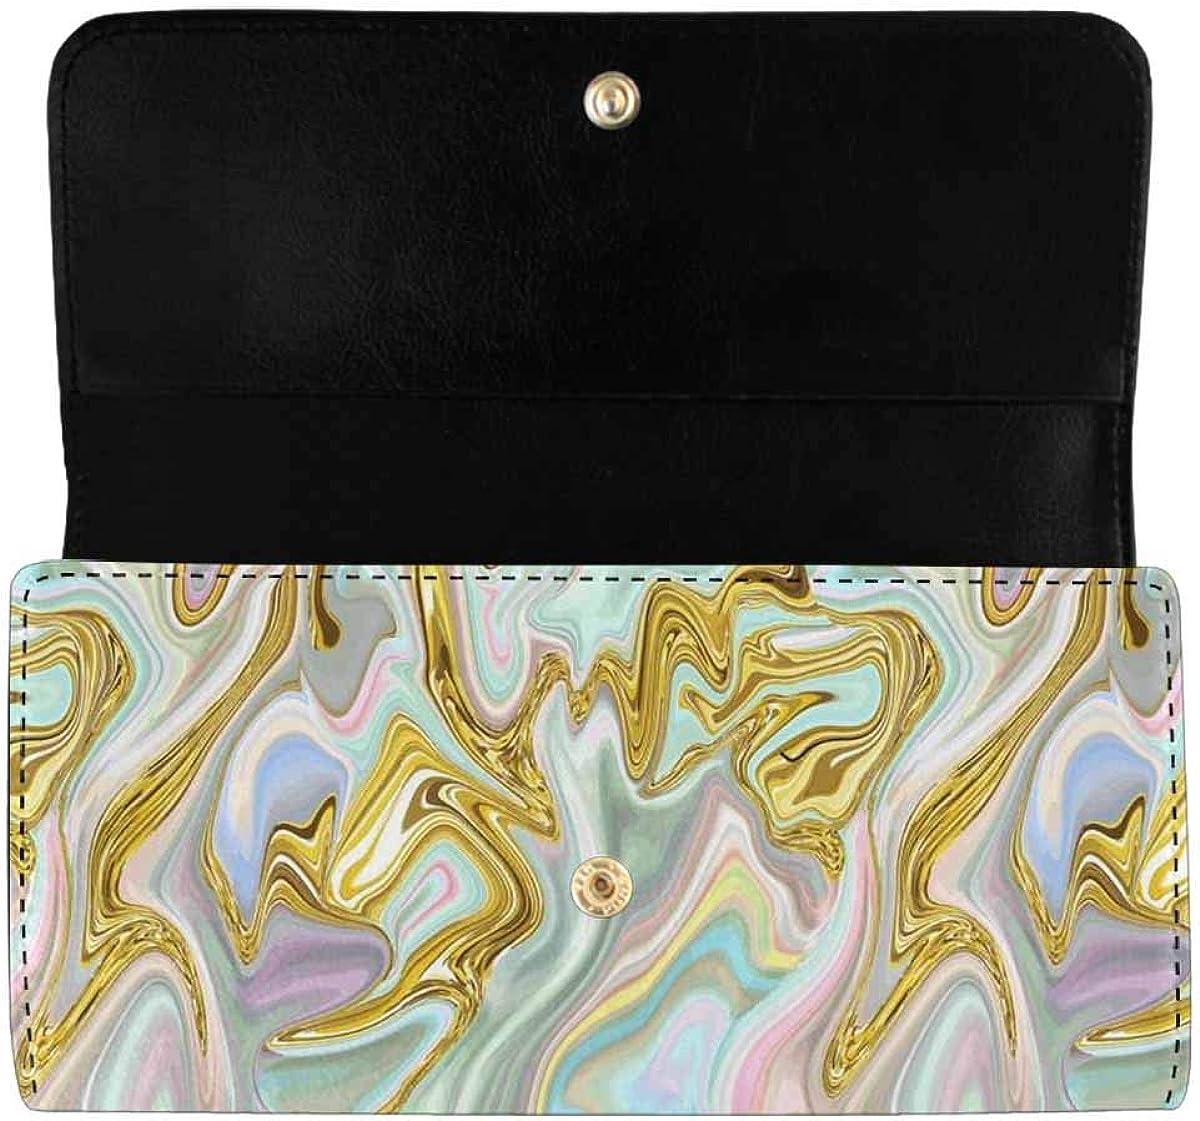 INTERESTPRINT Women's Long Clutch Wallets Gold Butterfly Ornamental Trifold Card Holder Purses